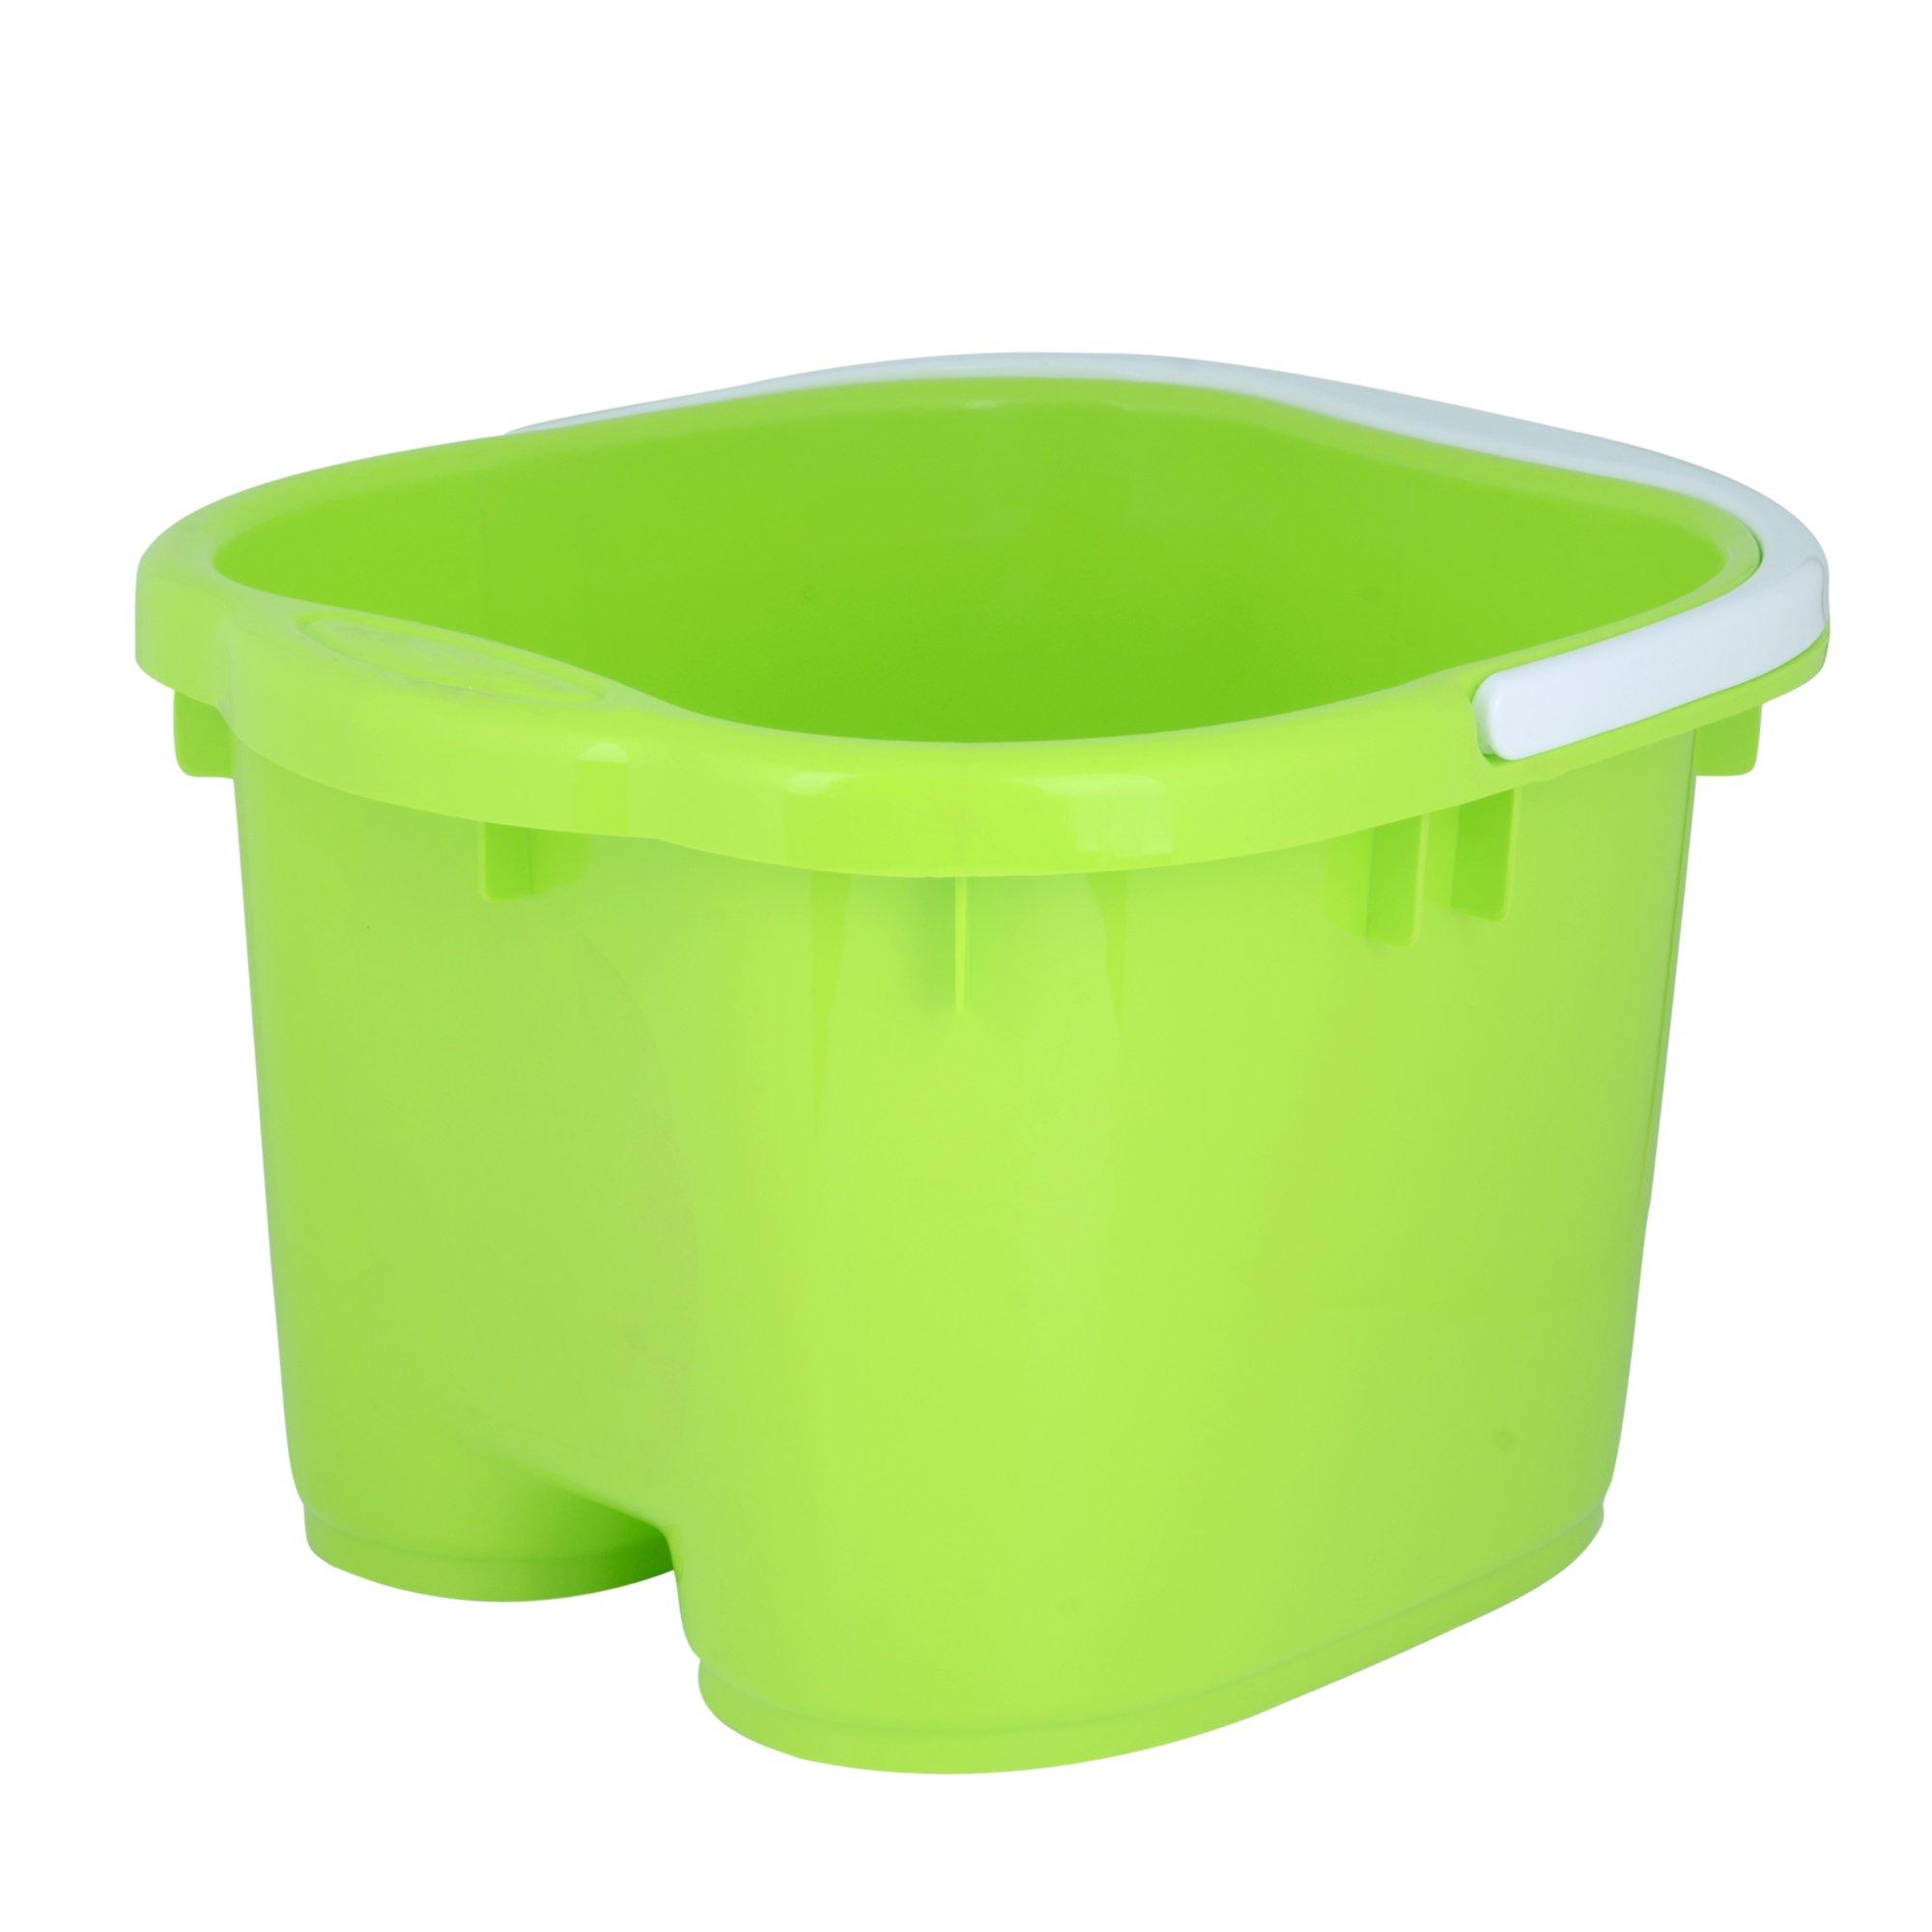 1pcs Foot Bath Practical Thicken Footbath Large Feet Tub for ...